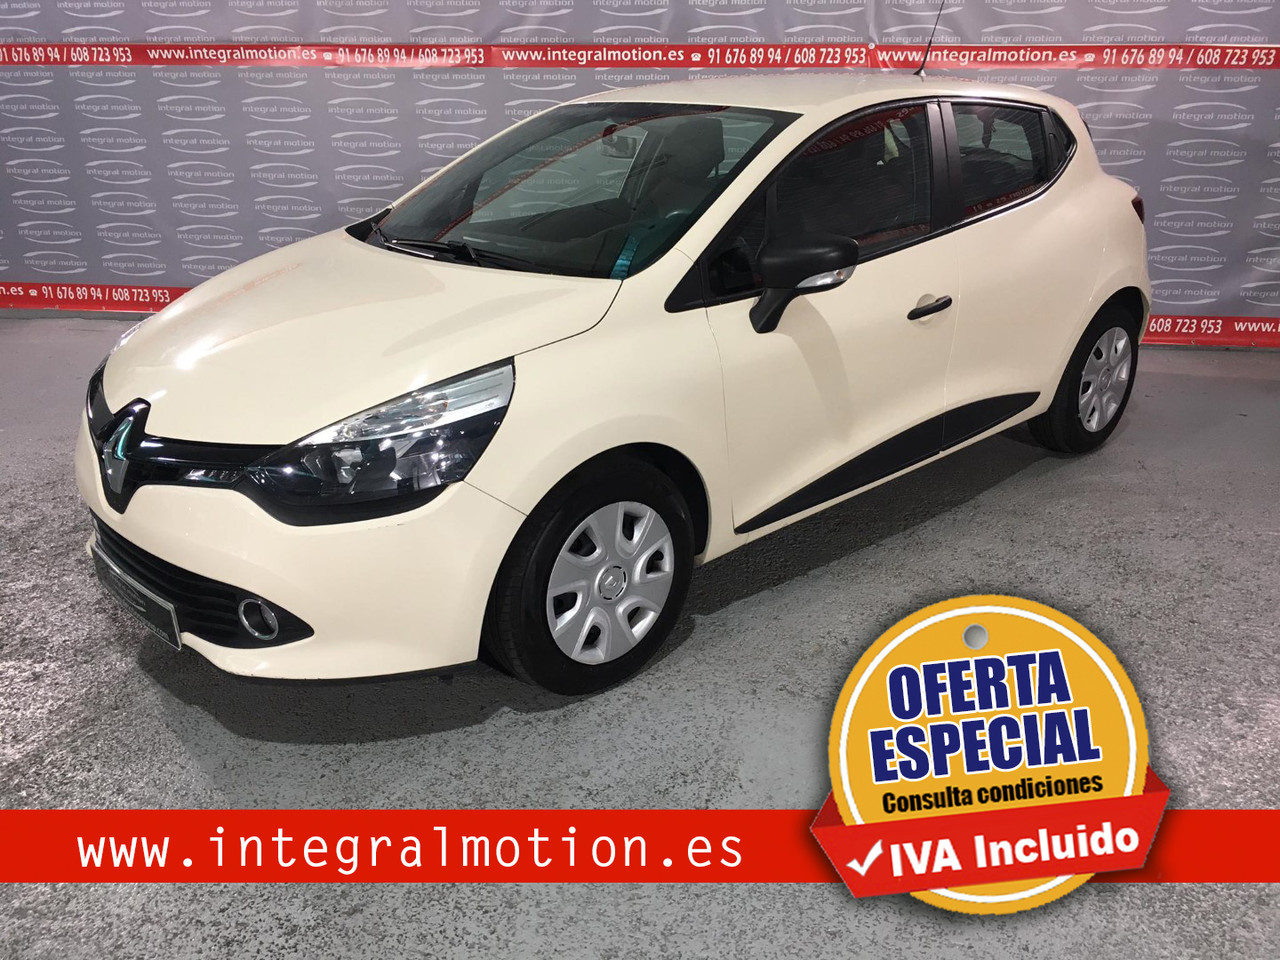 Renault Clio Business dCi 55kW (75CV) -18  - Foto 1